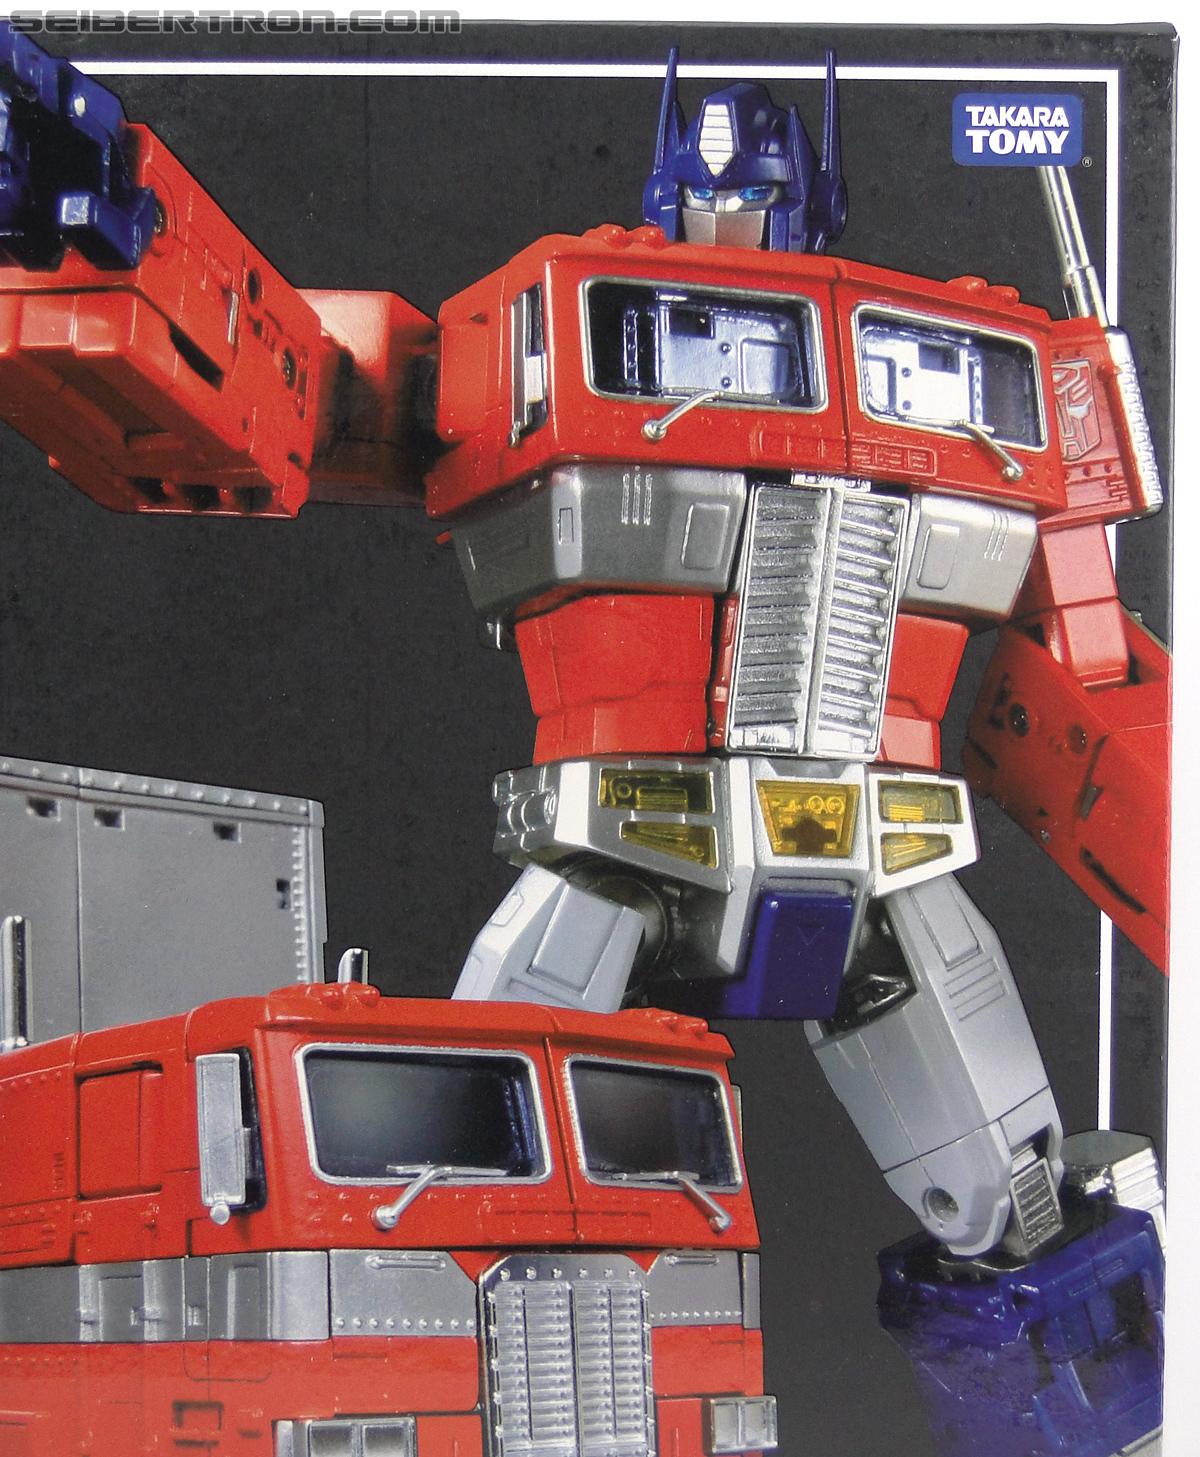 Transformers Masterpiece Optimus Prime (MP-10) (Convoy) (Image #2 of 429)